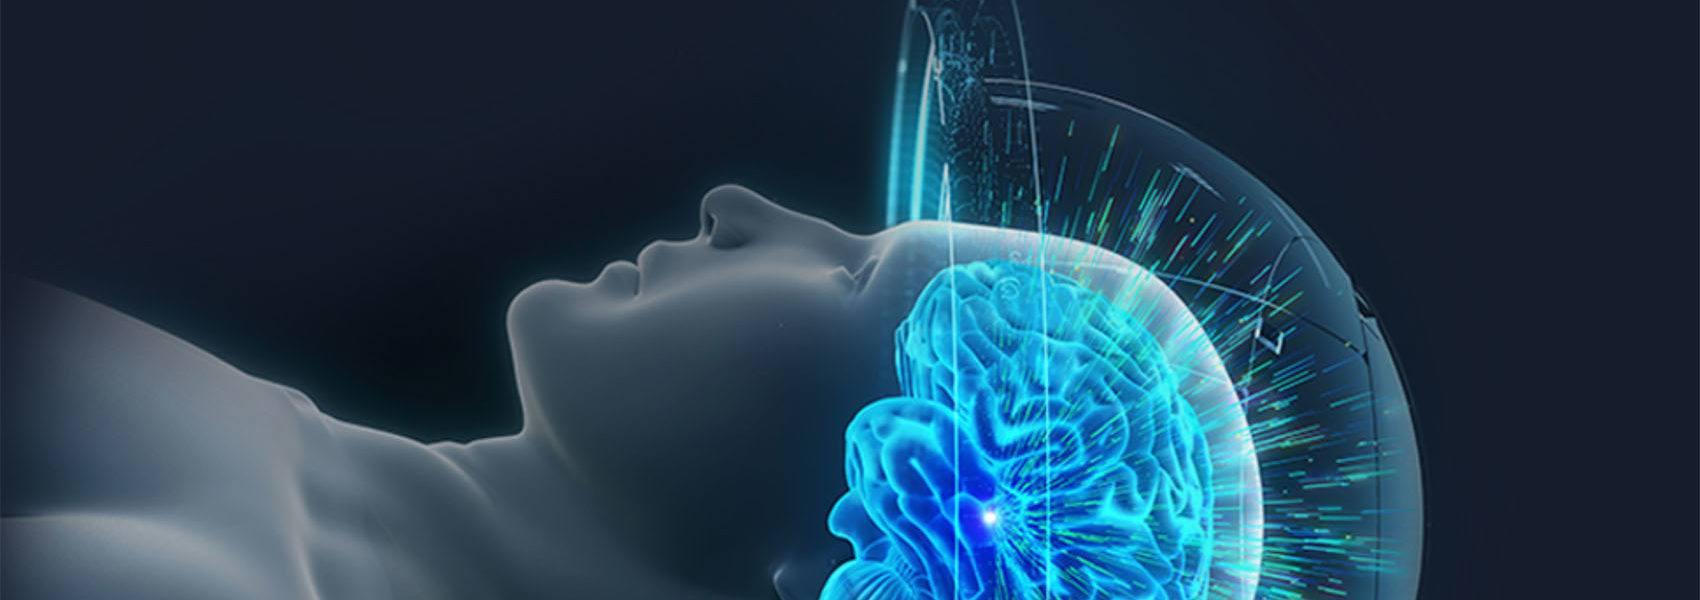 Rendering of patient receiving MRI treatment